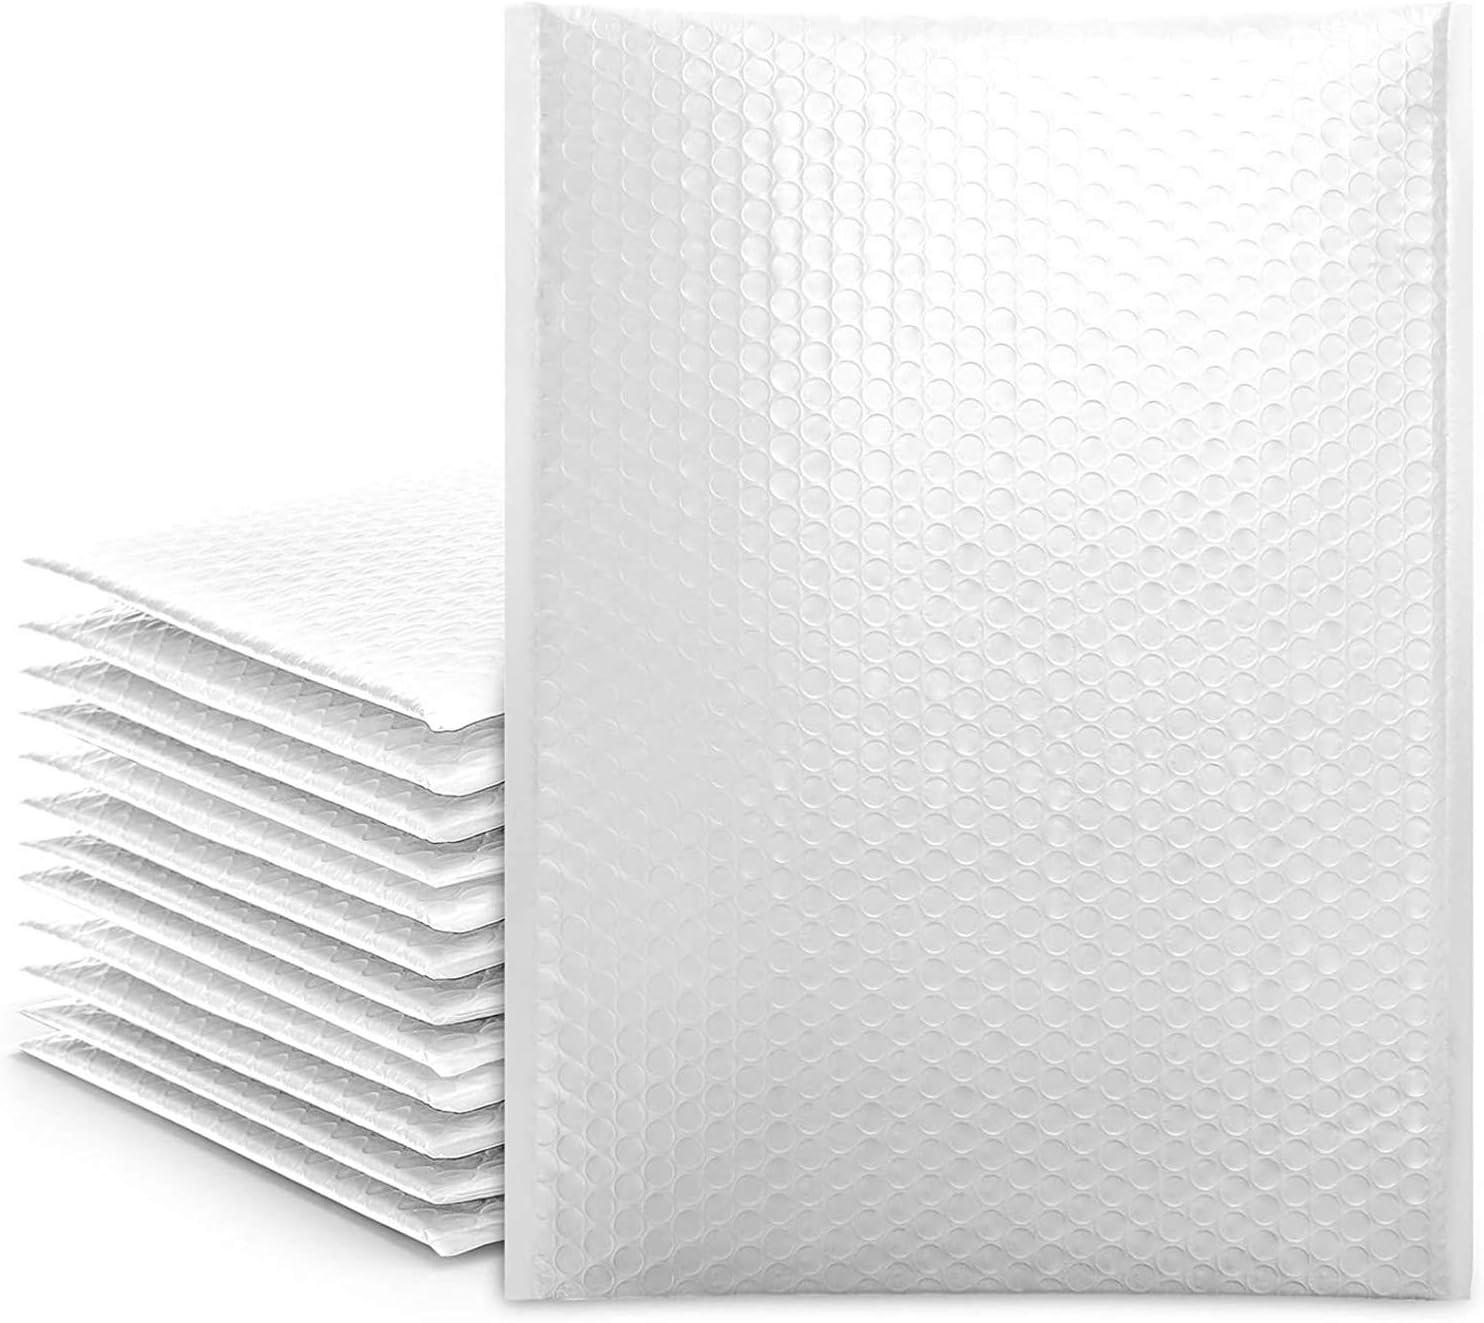 cozymood 25 Popular Super intense SALE brand Pcs White Poly Mailers Bubble 10.5x16